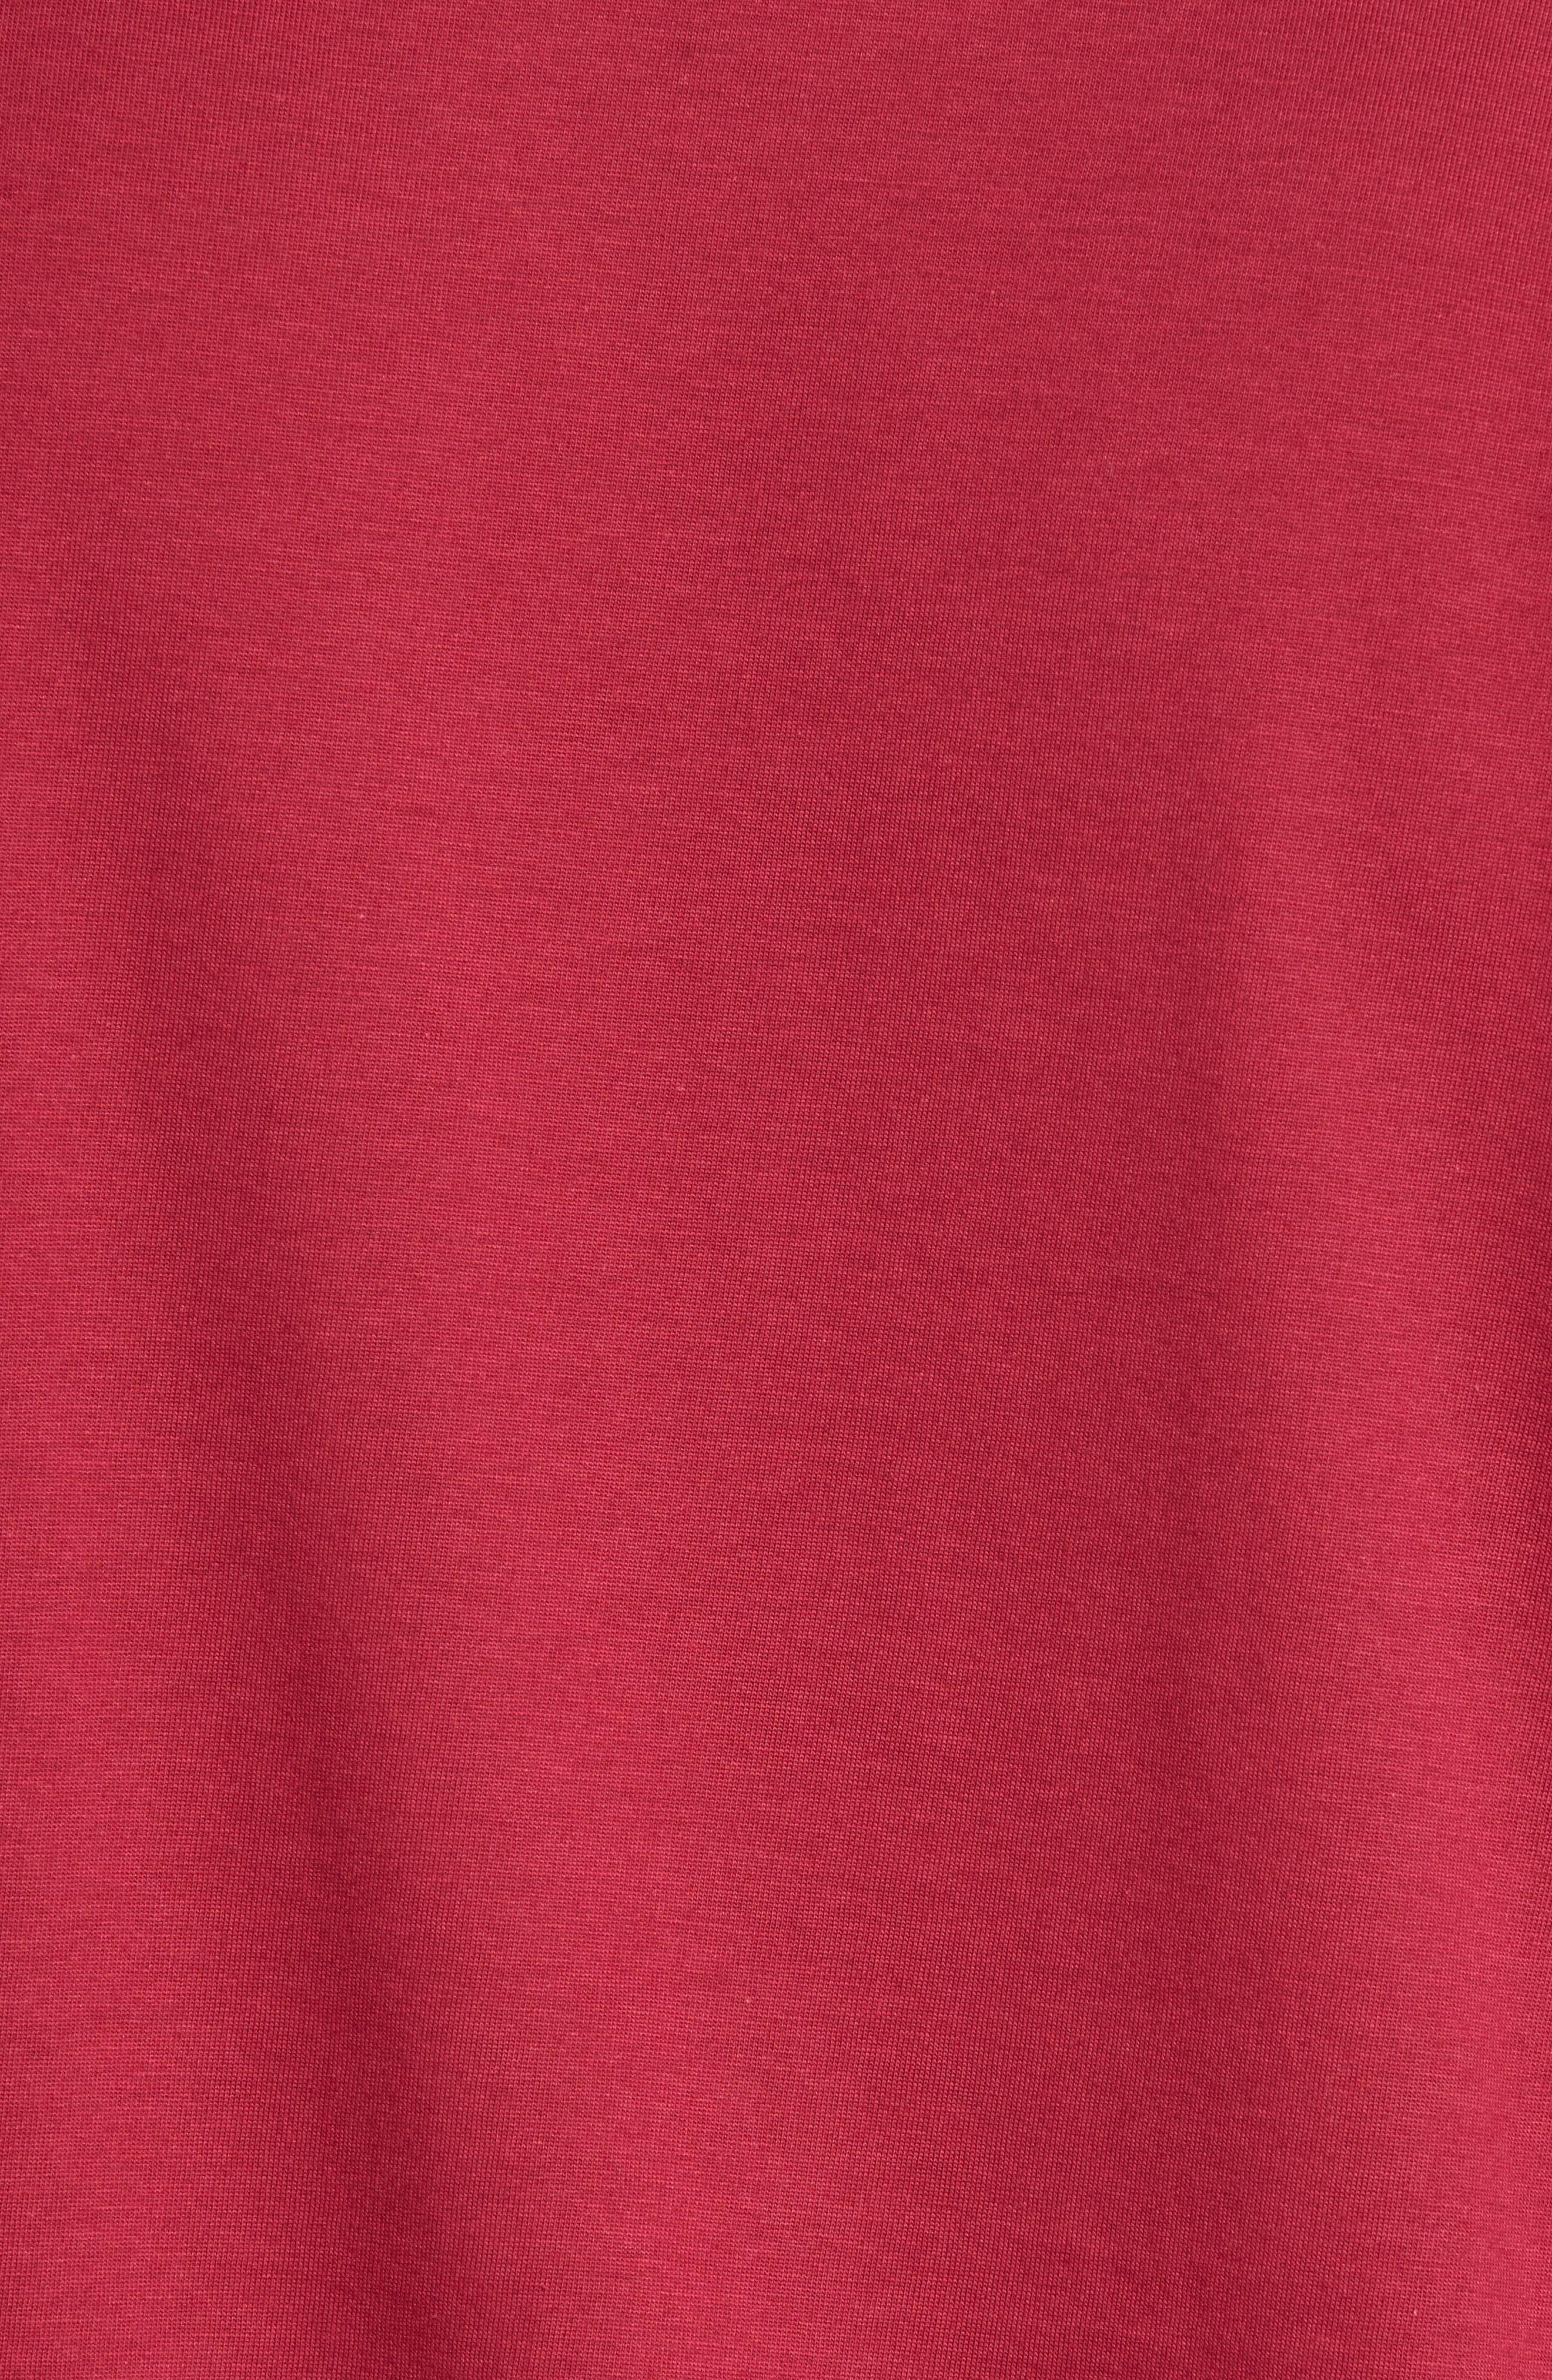 Alternate Image 5  - Lacoste Pima Cotton T-Shirt